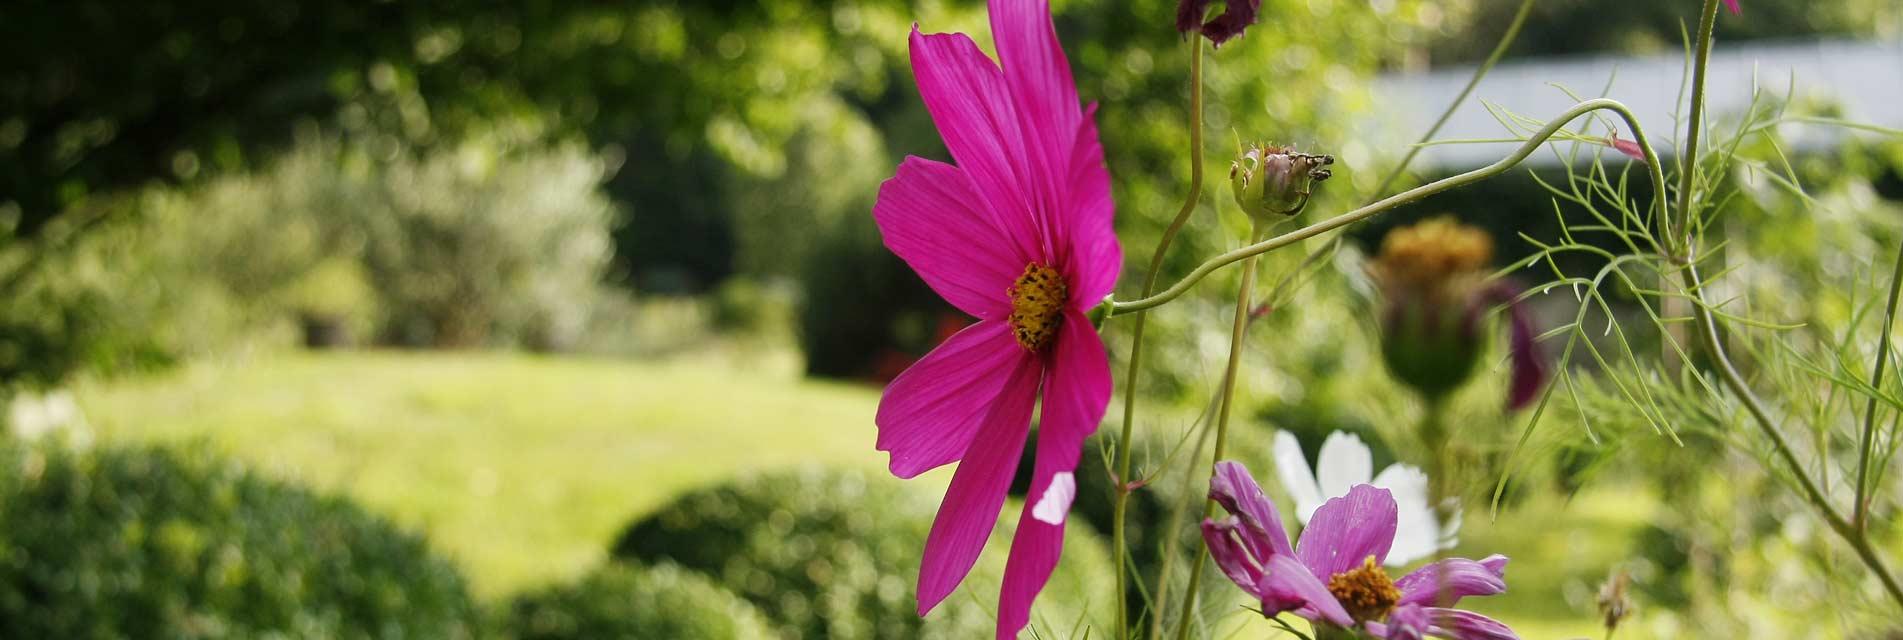 Vacances au jardin dans le Tarn Occitanie